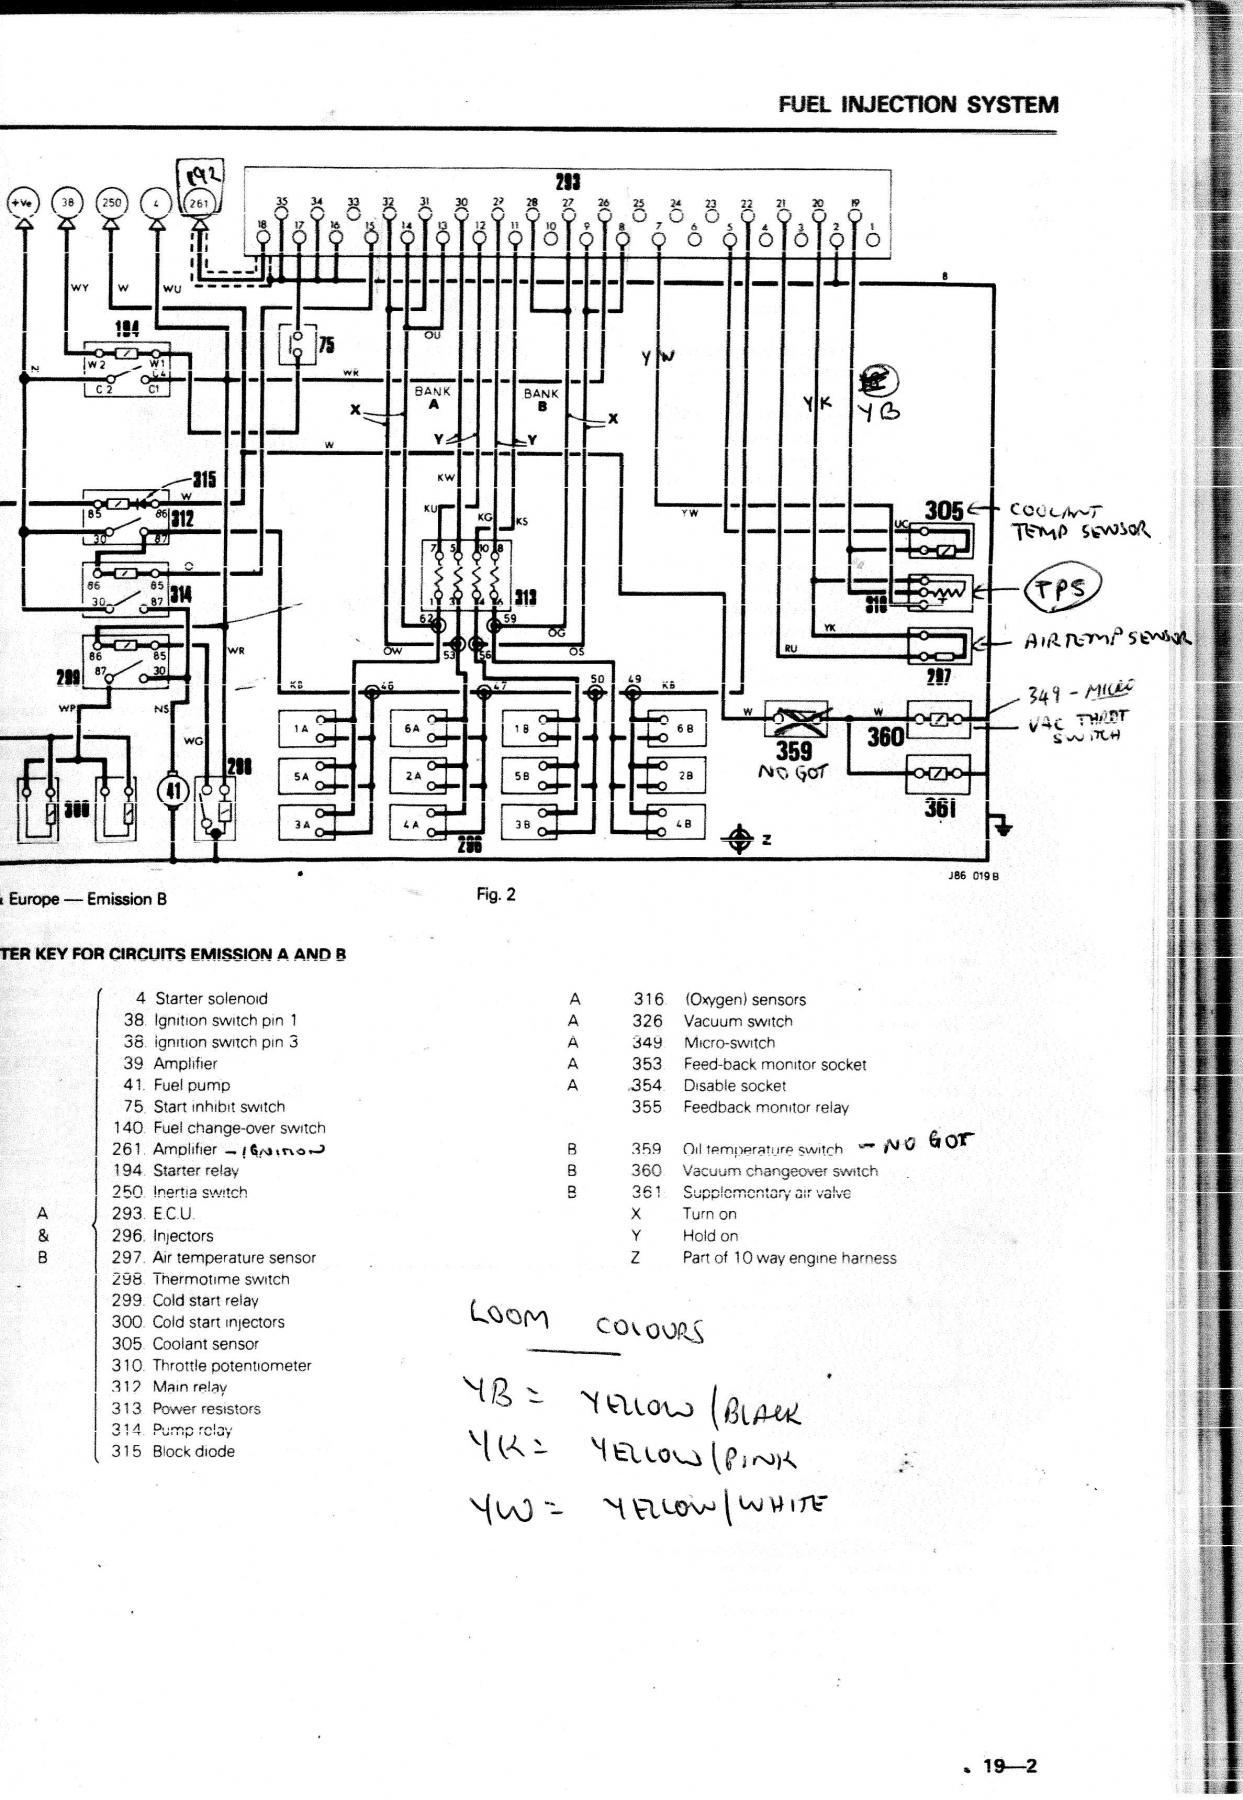 1989 Jaguar Xj6 Wiring Diagram Manual Guide 1996 1986 Library Rh 77 Codingcommunity De 1987